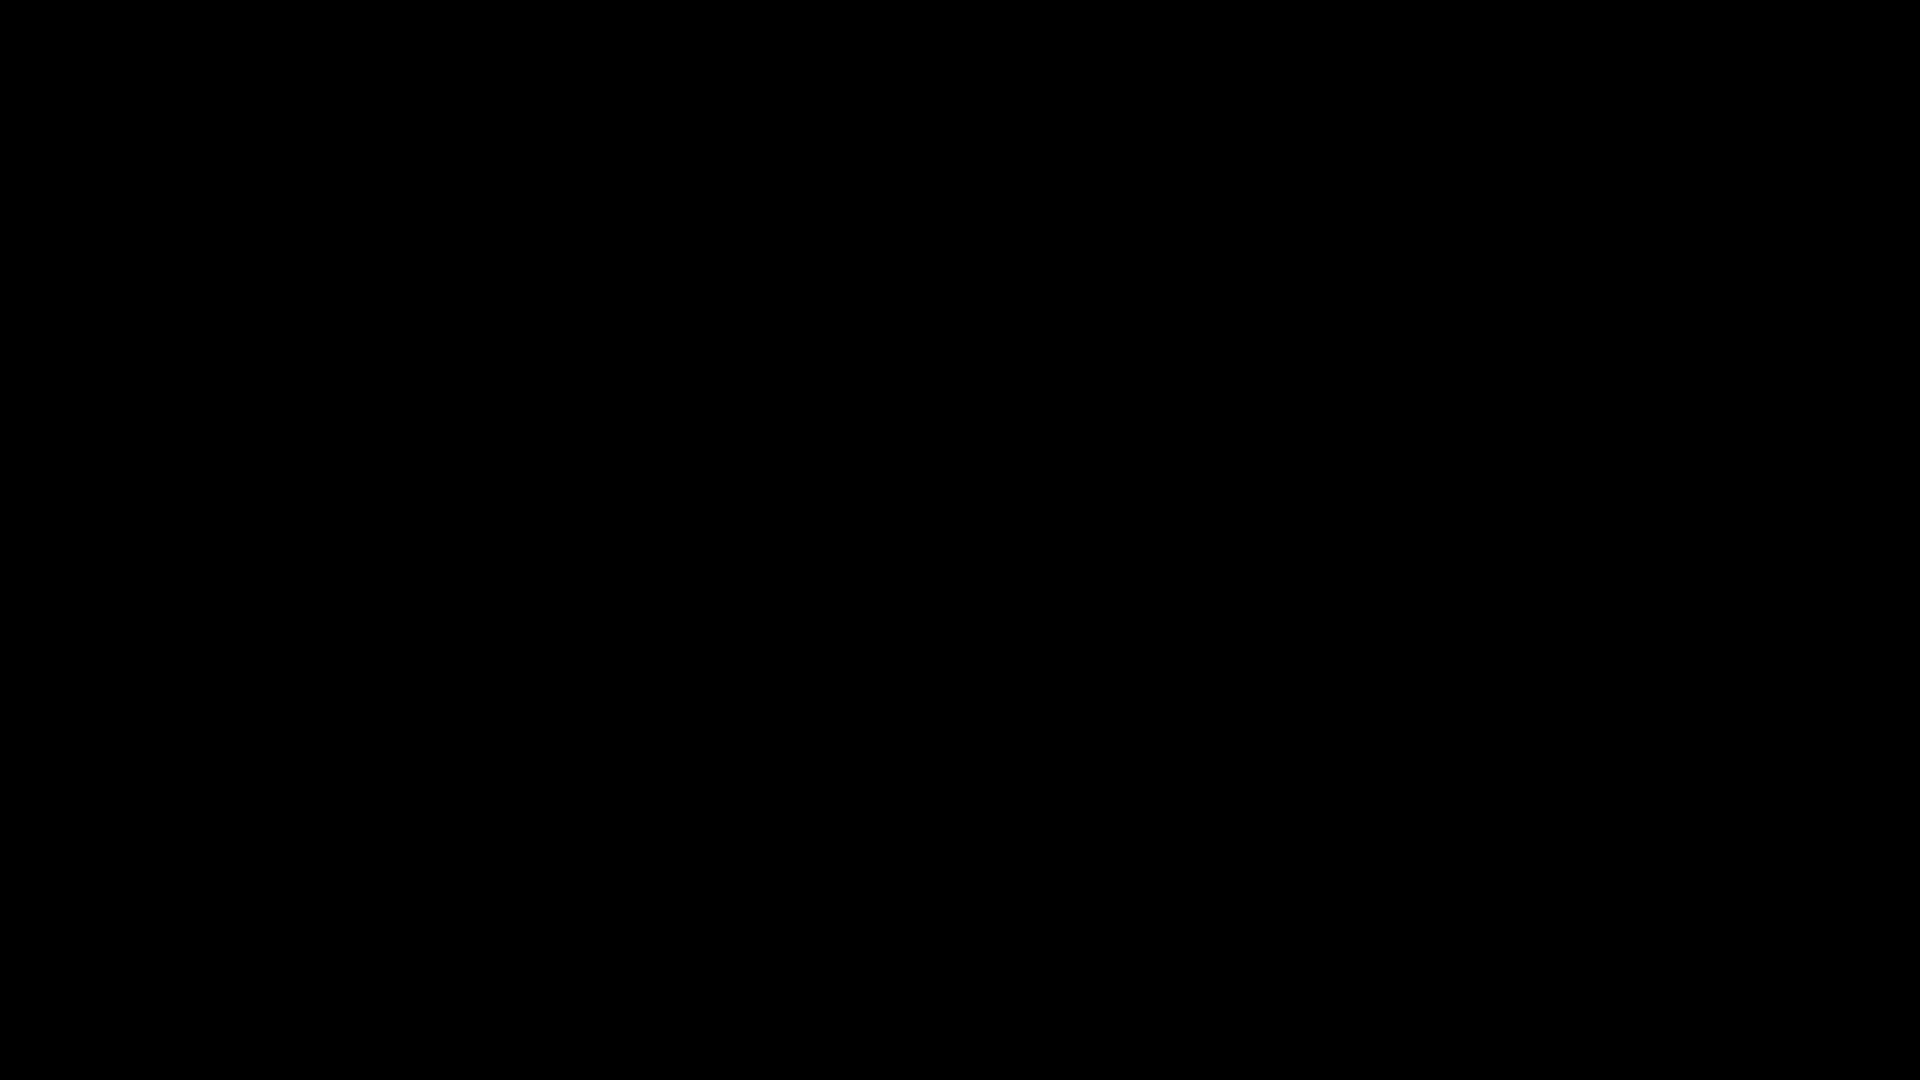 Fatshark, Gaming, co-op, fantasy, vermintide, vermintide 2, warhammer, warhammer: vermintide 2, Warhammer: Vermintide 2 | Gameplay Trailer GIFs